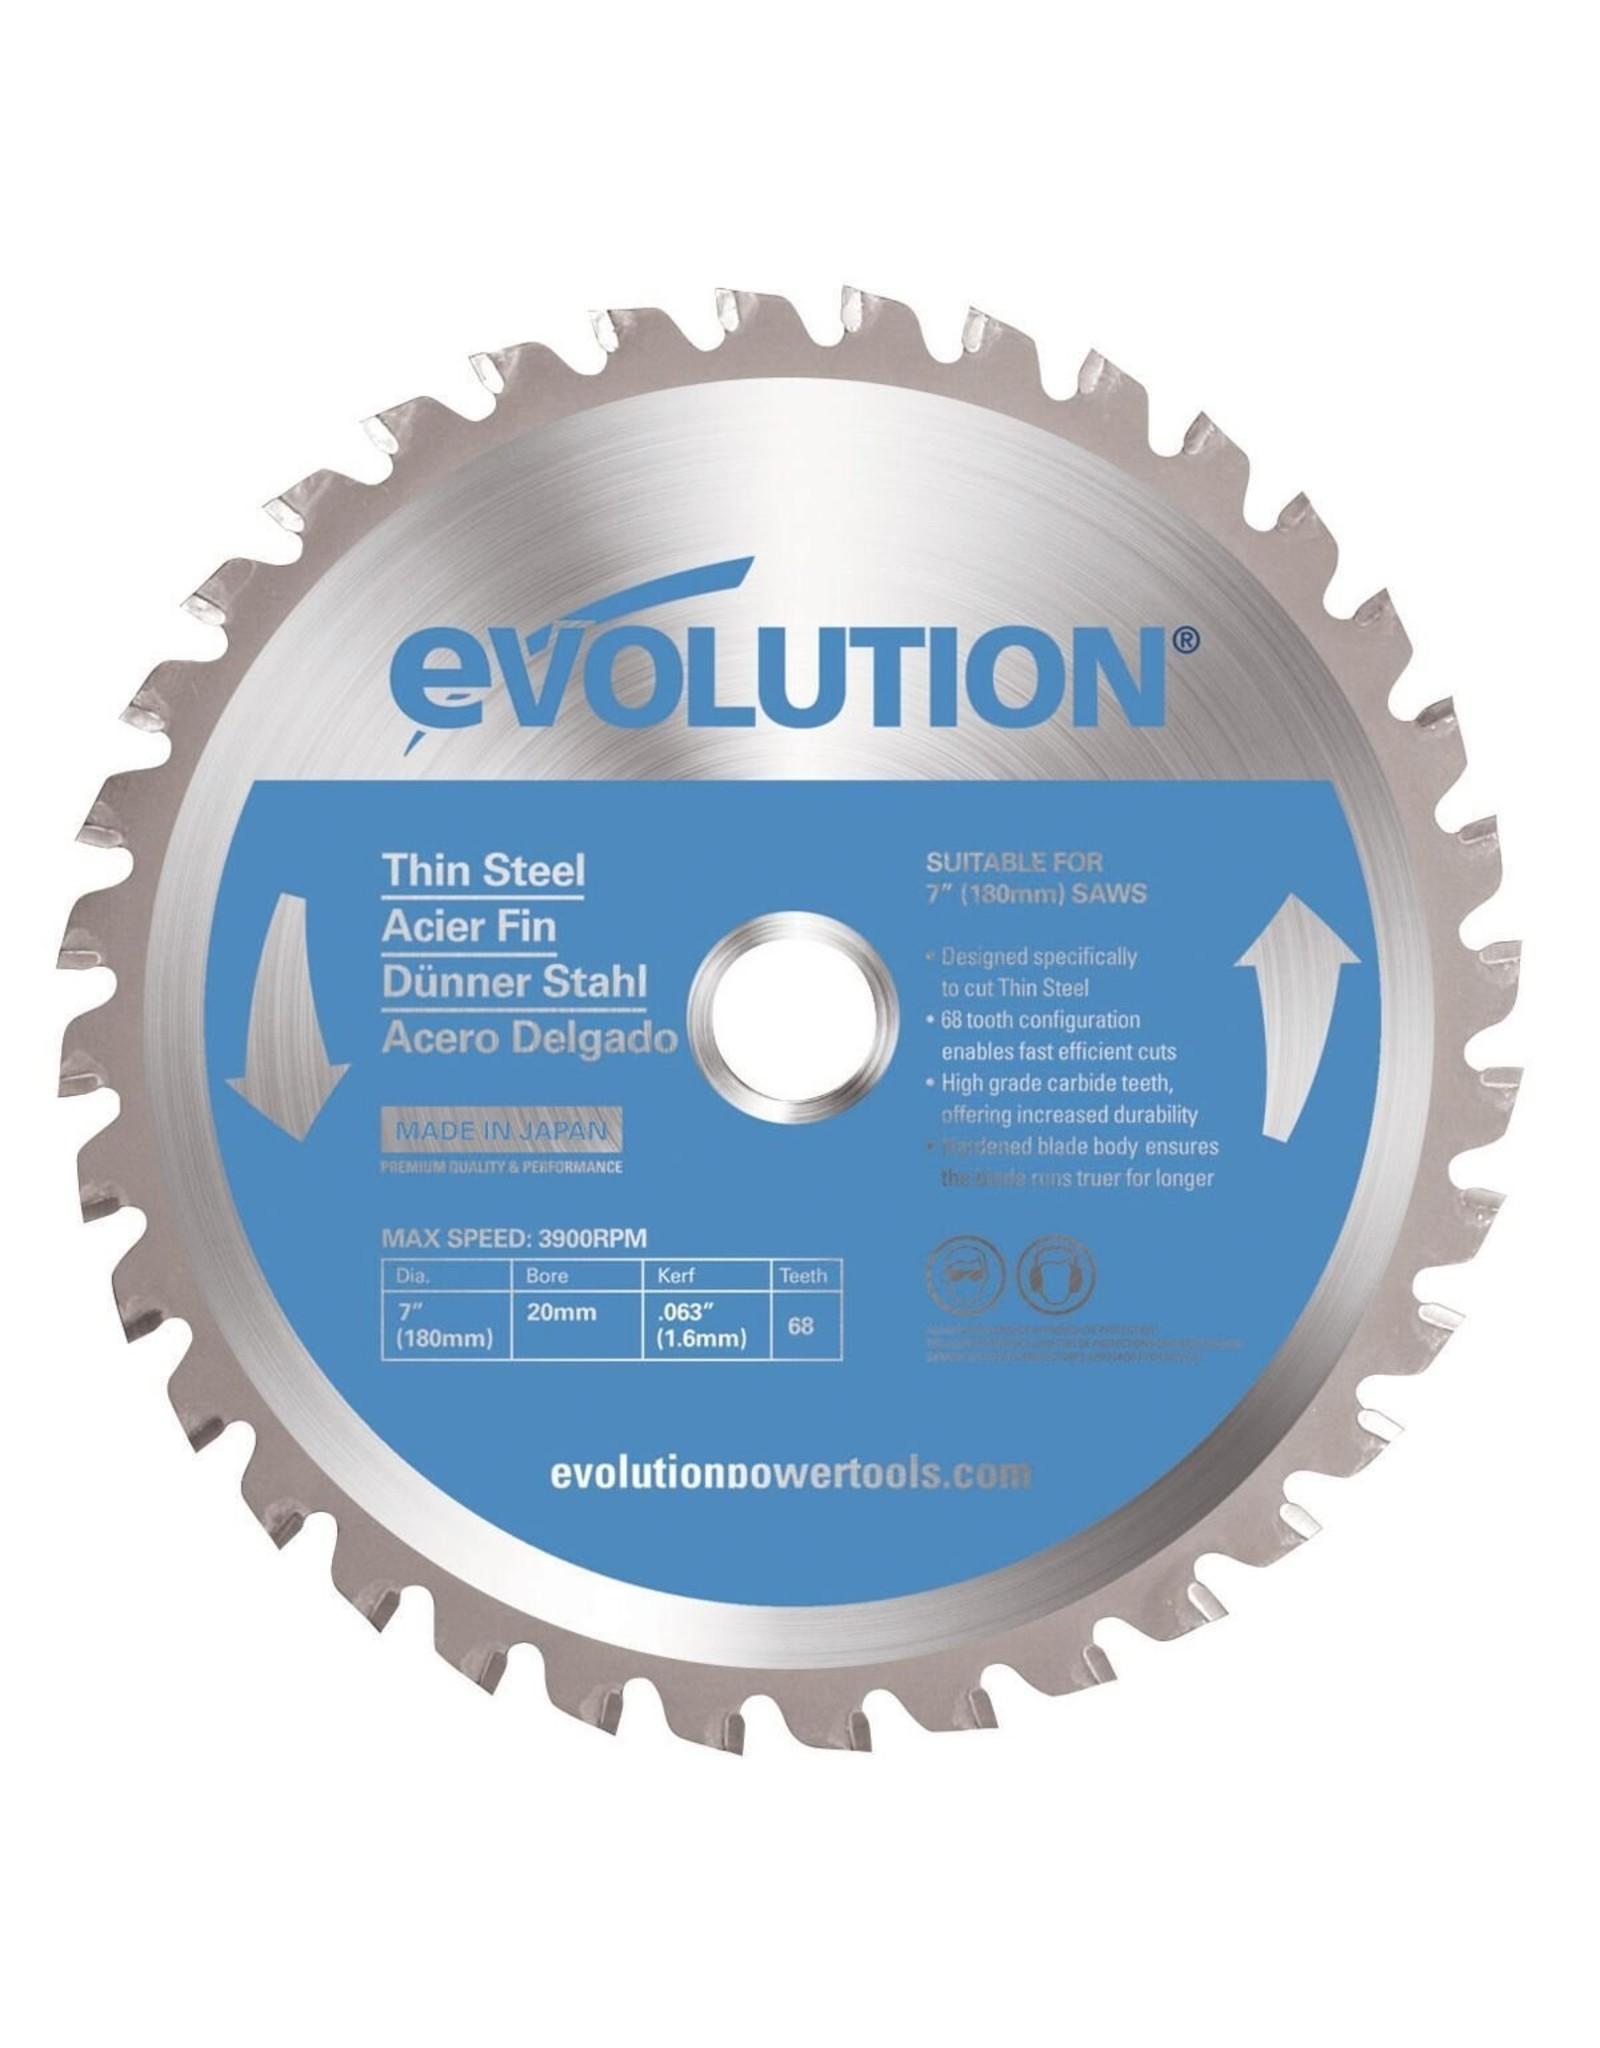 Evolution Power Tools Steel Line LAME DE SCIE ACIER FIN 180 MM